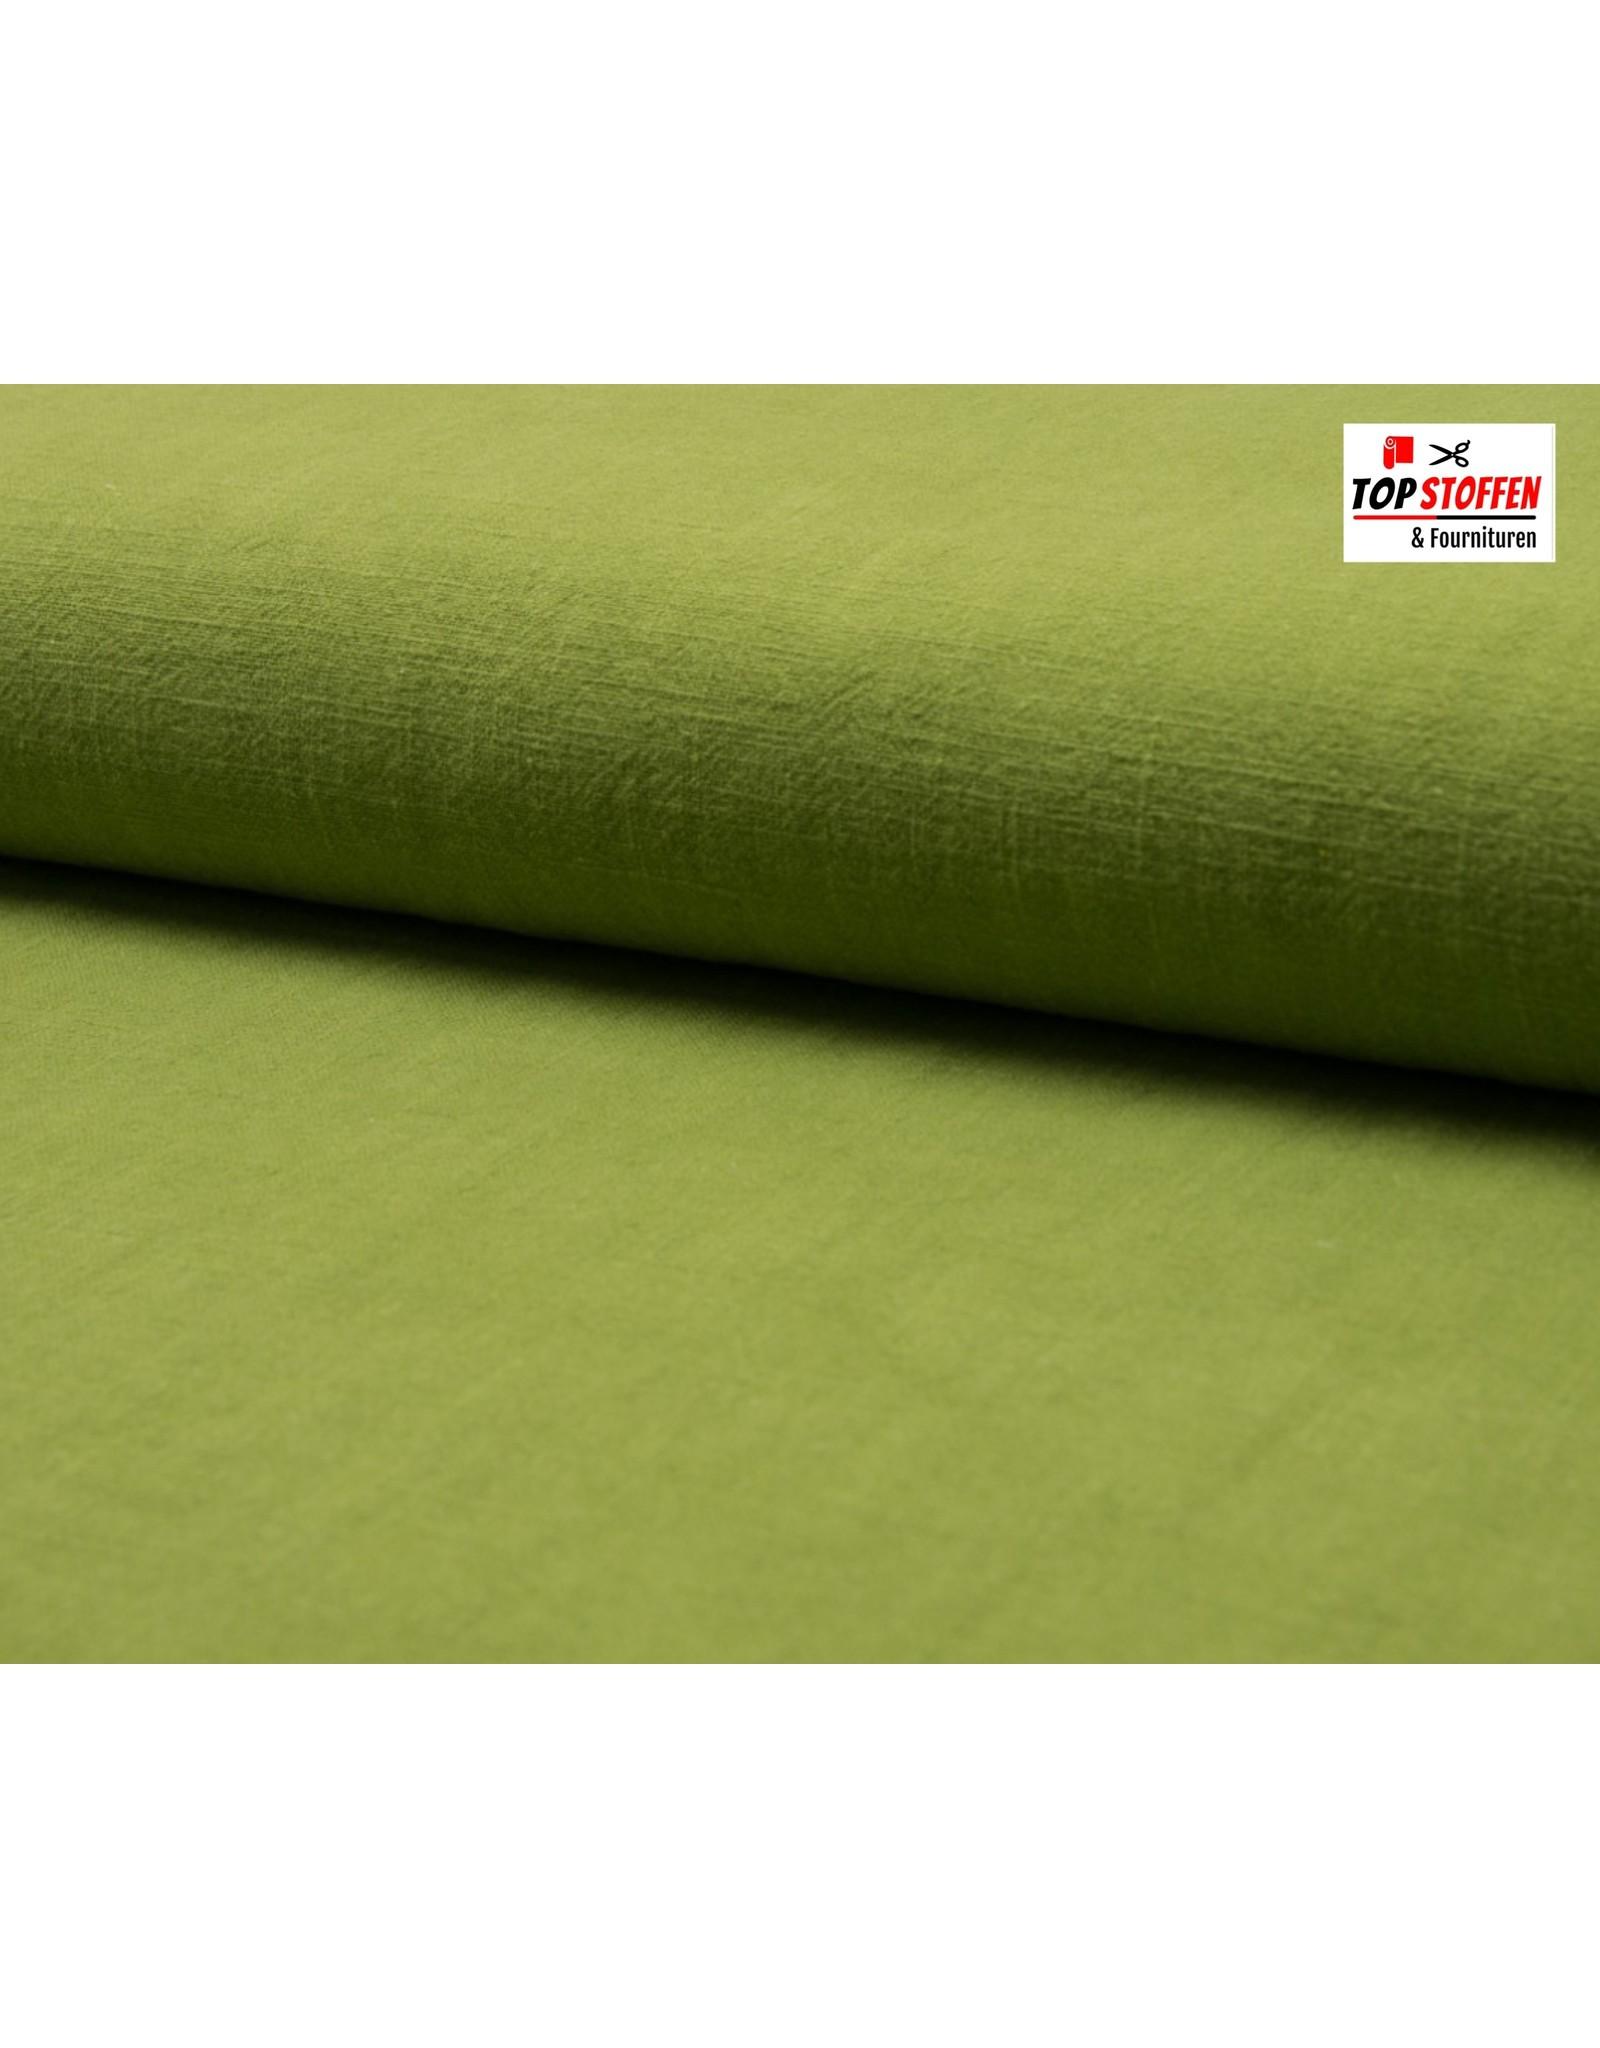 Pflanzen Leinen - Lime